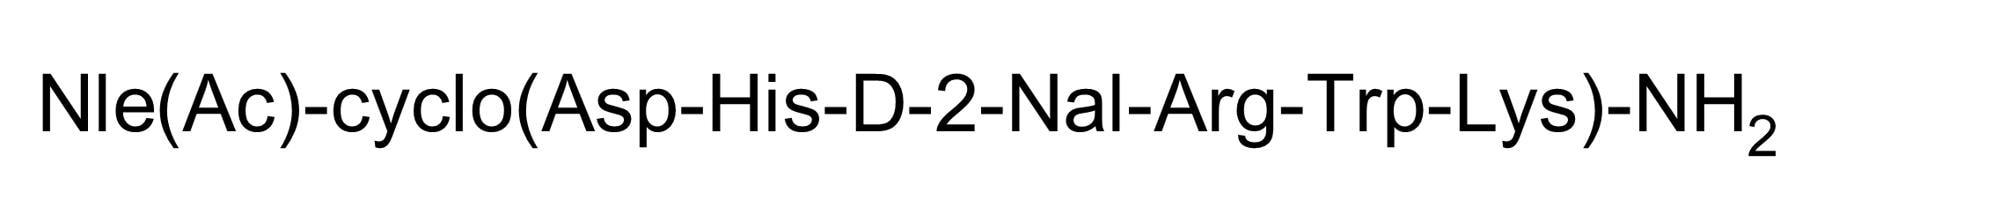 Chemical Structure - SHU9119, Melanocortin 3 and 4 (MC<sub>3</sub> and MC<sub>4</sub>) receptor antagonist (ab141164)